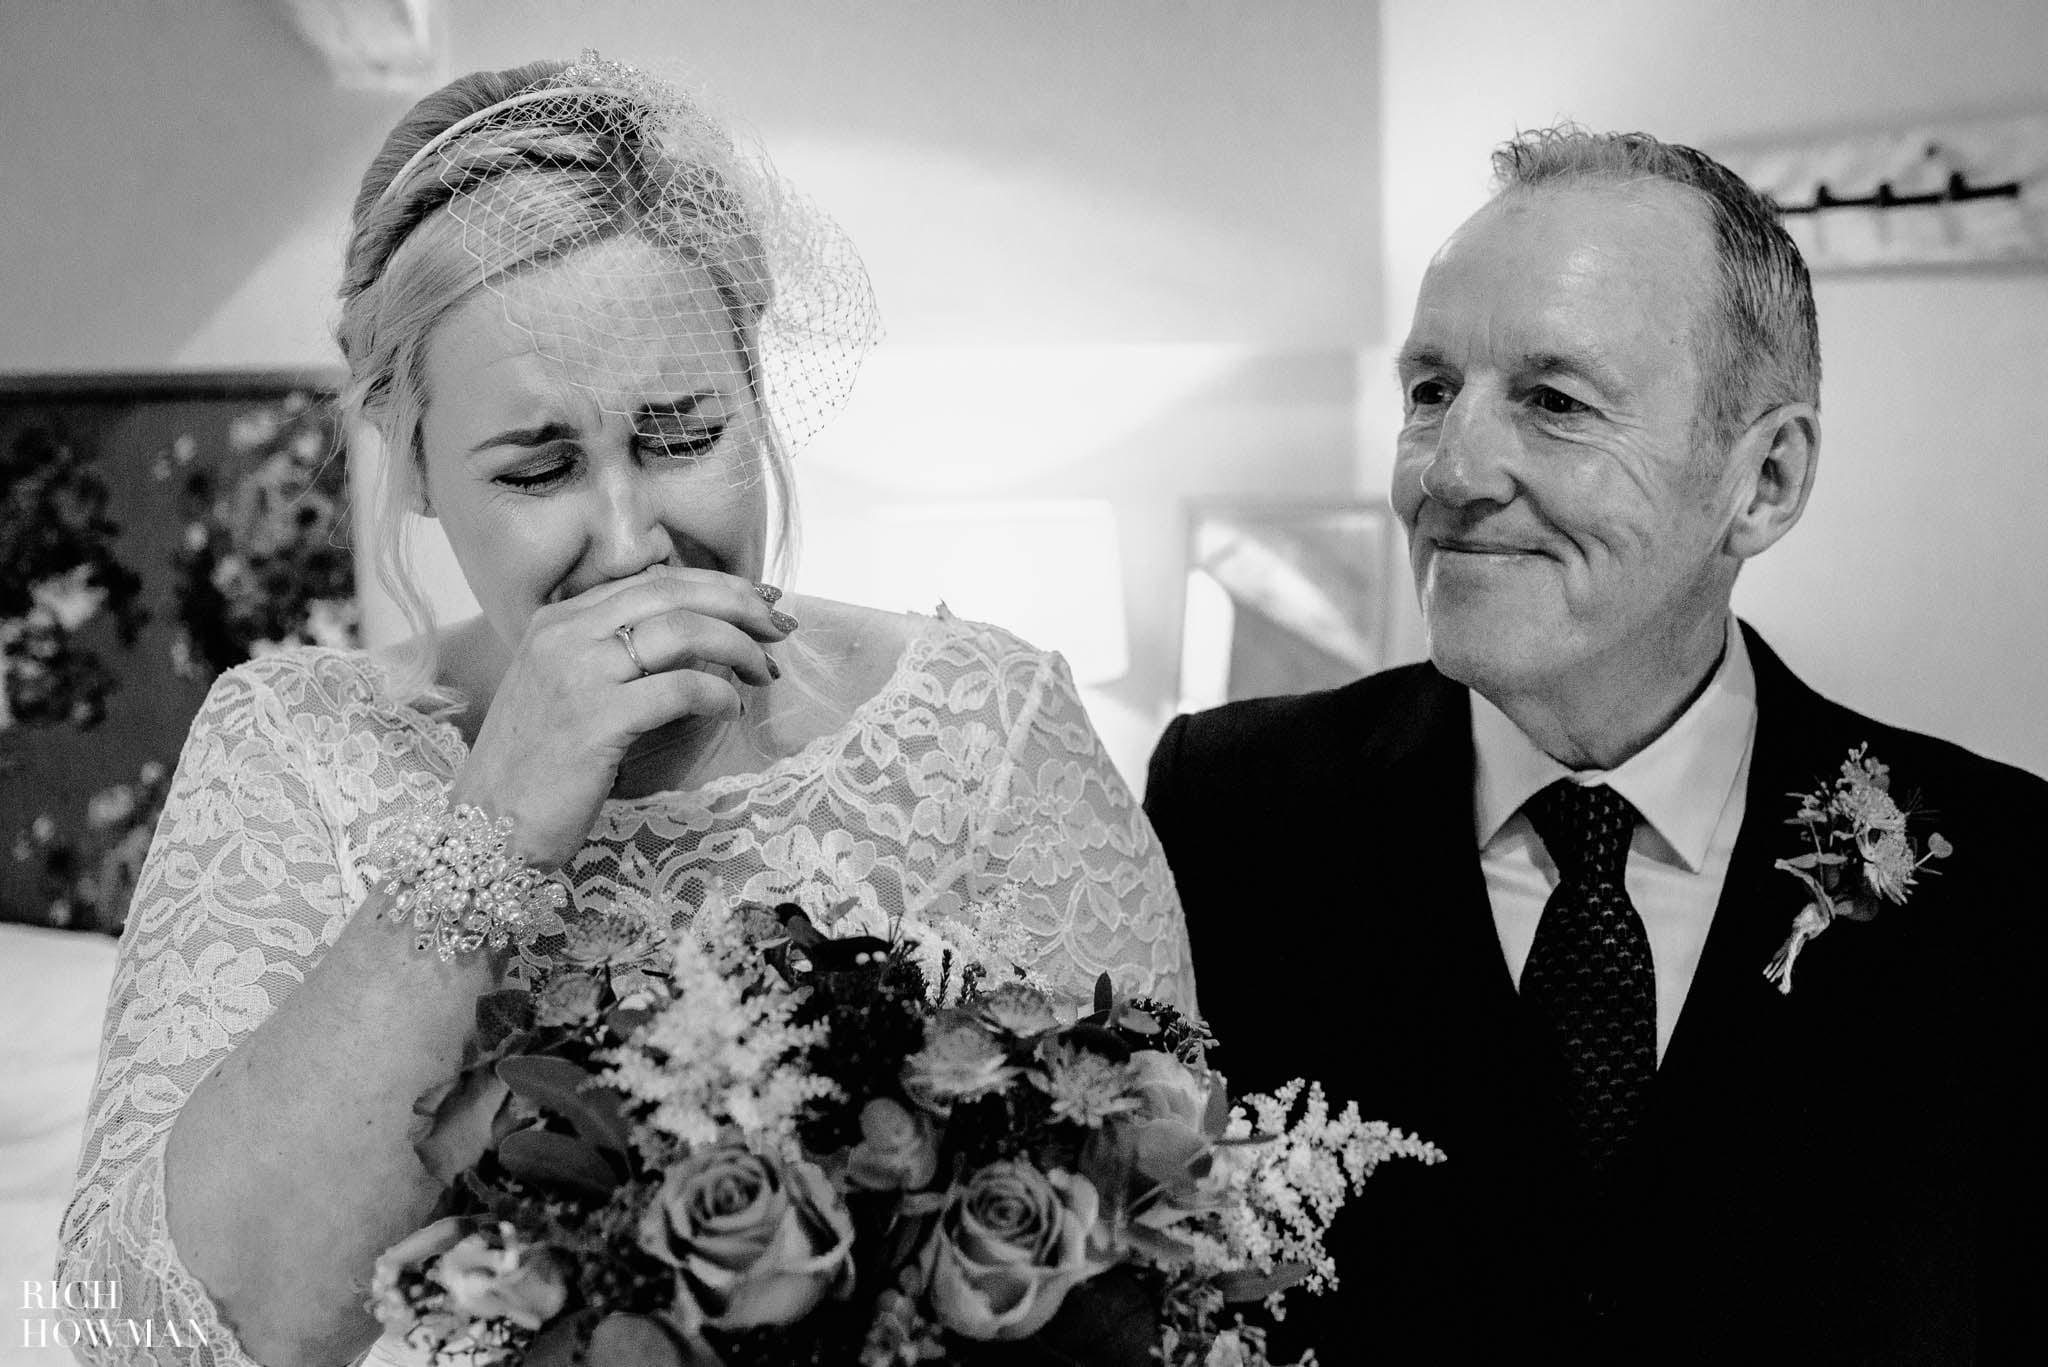 Folly Farm Centre Wedding Photographers - Outdoor Wedding Ceremony